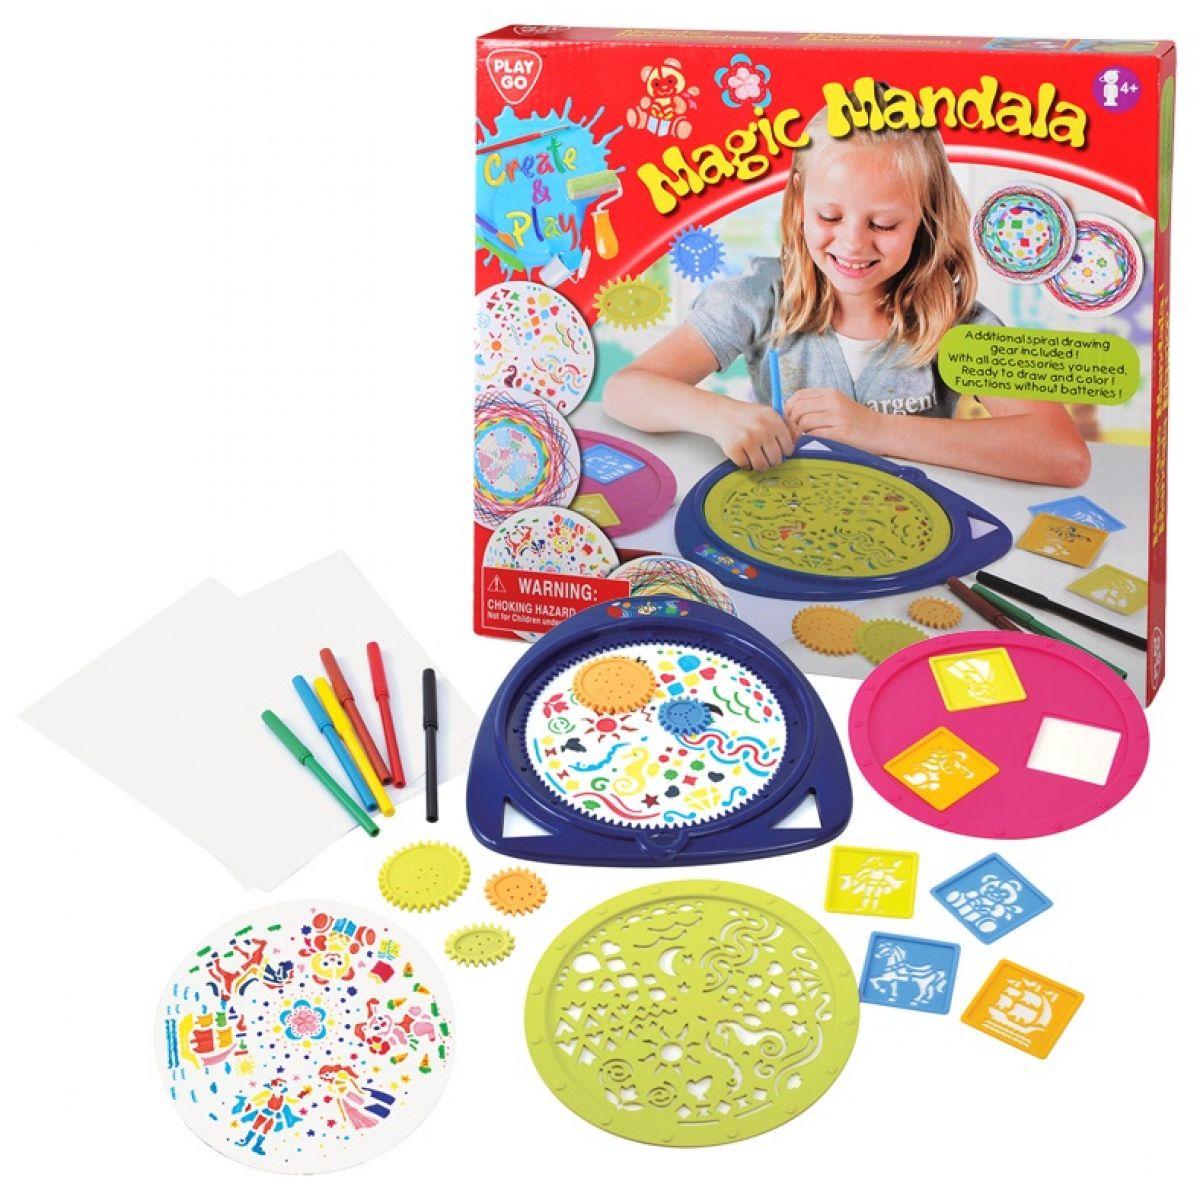 Playgo Magická Mandala